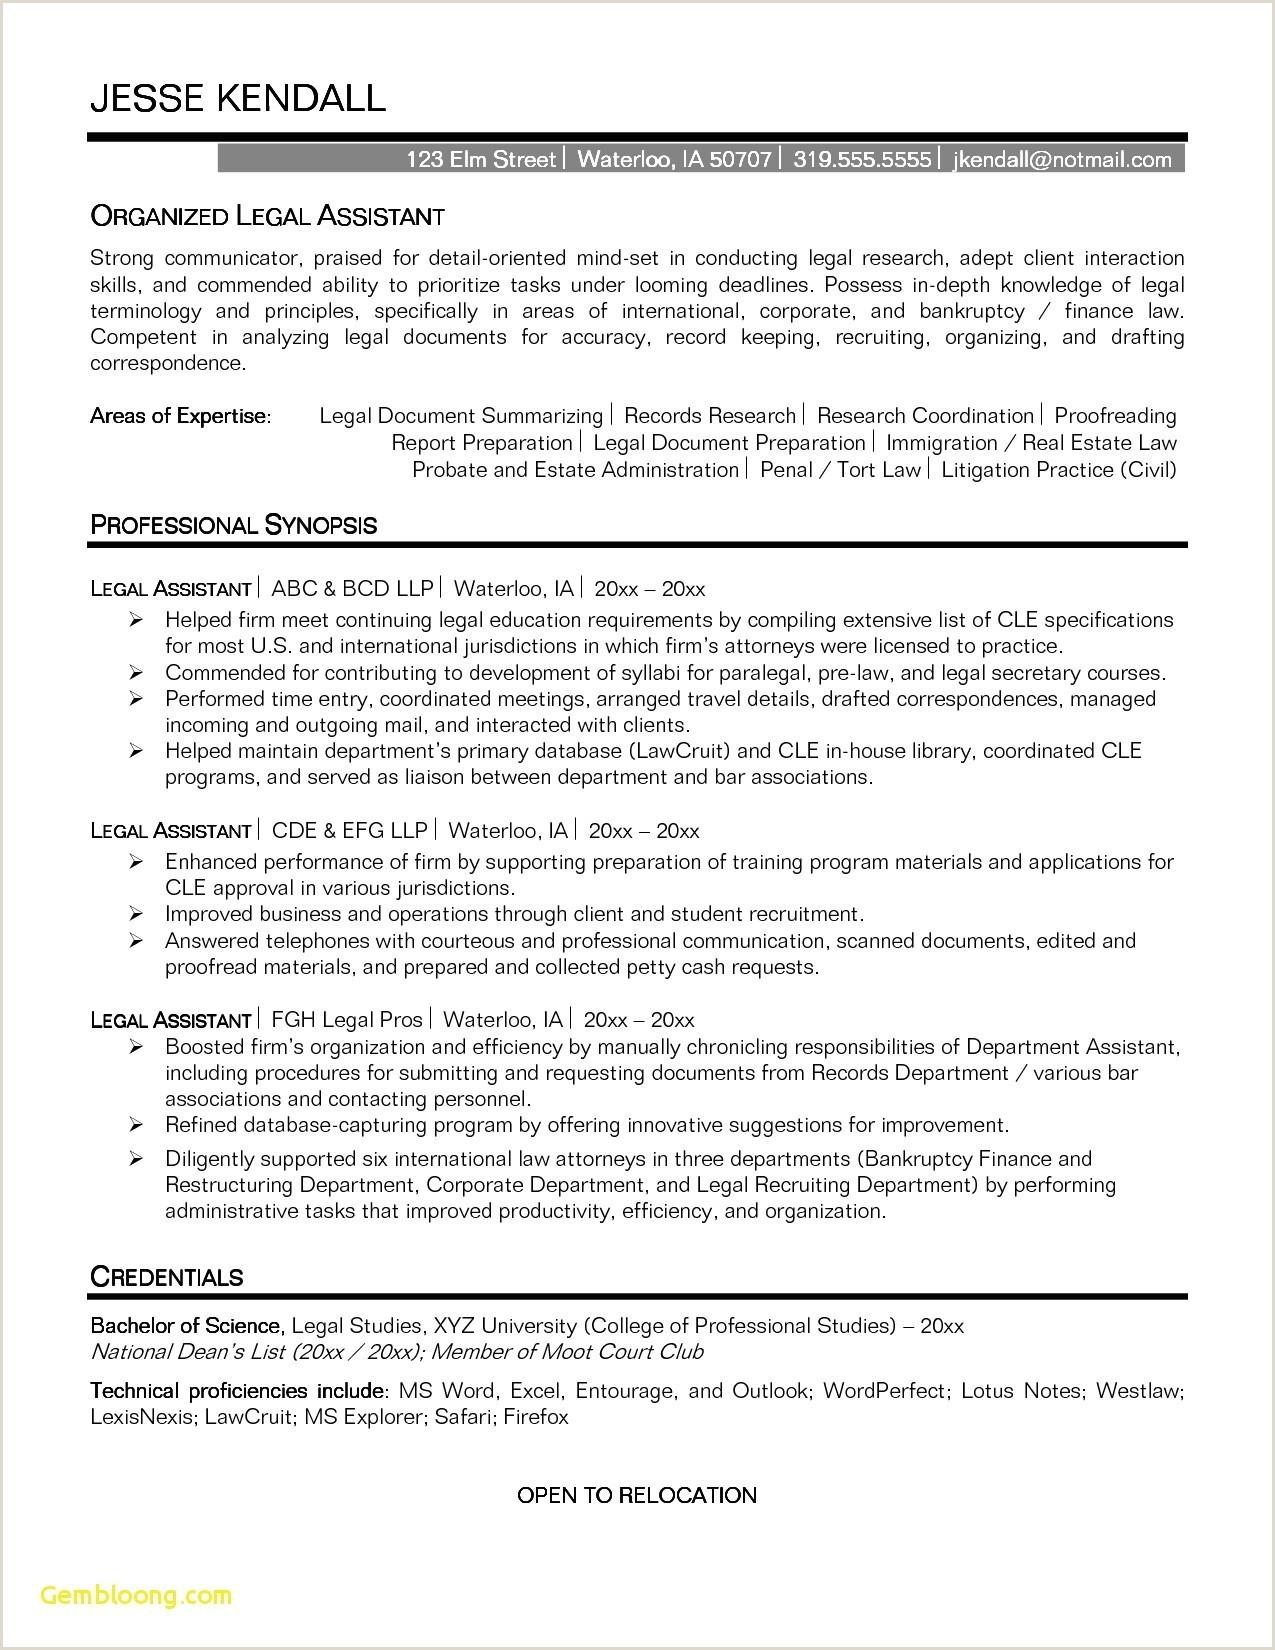 Unique Sample Legal assistant Resume